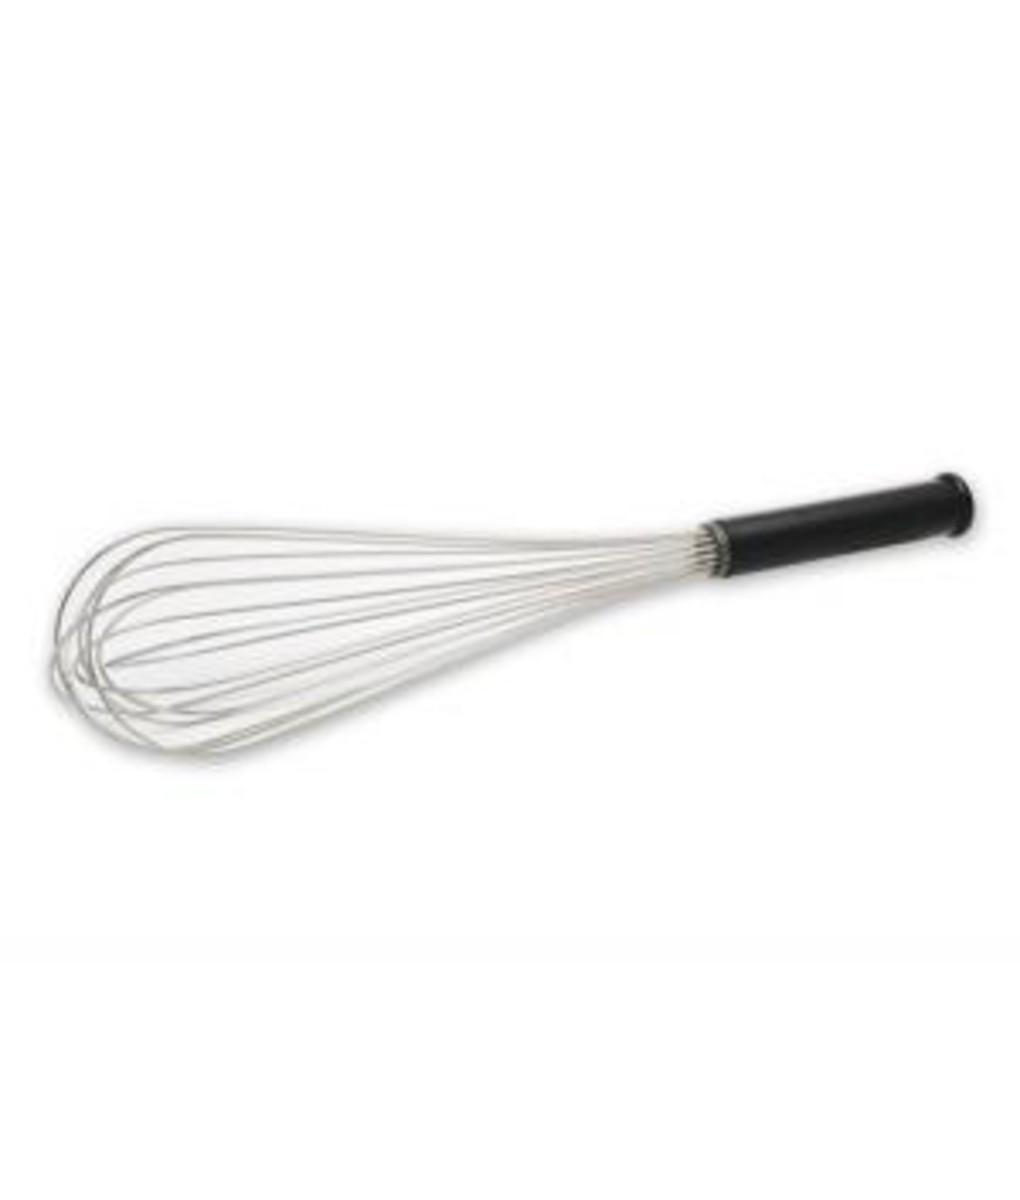 Whisk Black Handle 31cm